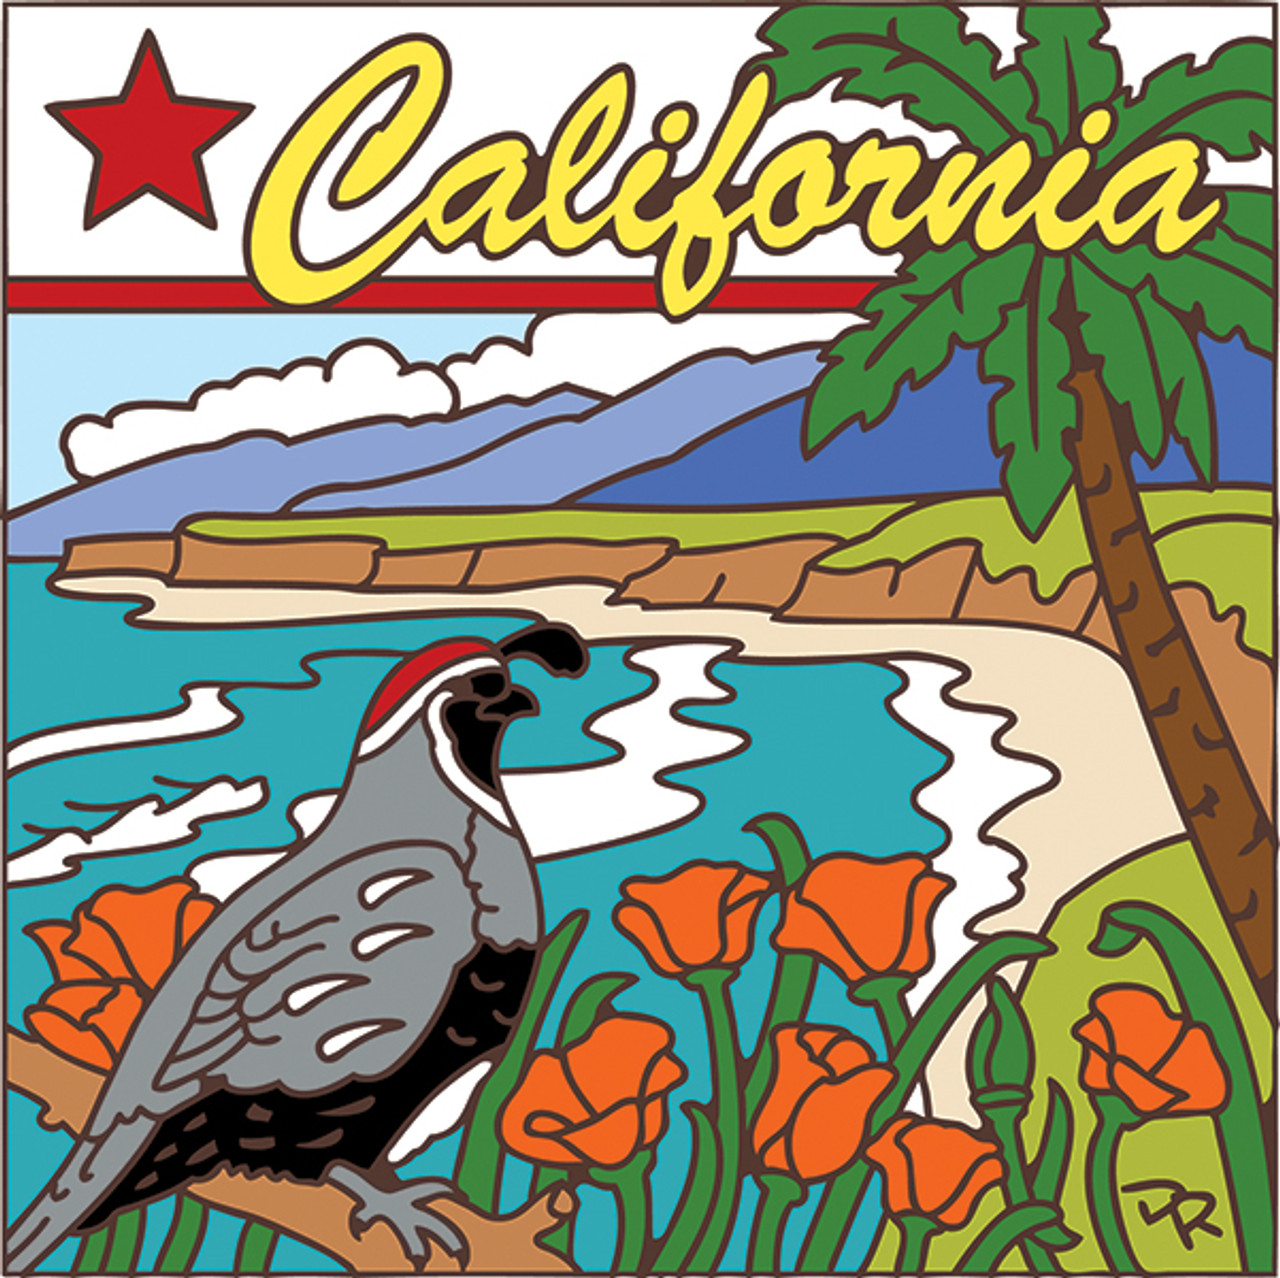 6x6 California State Symbols Decorative Art Tile